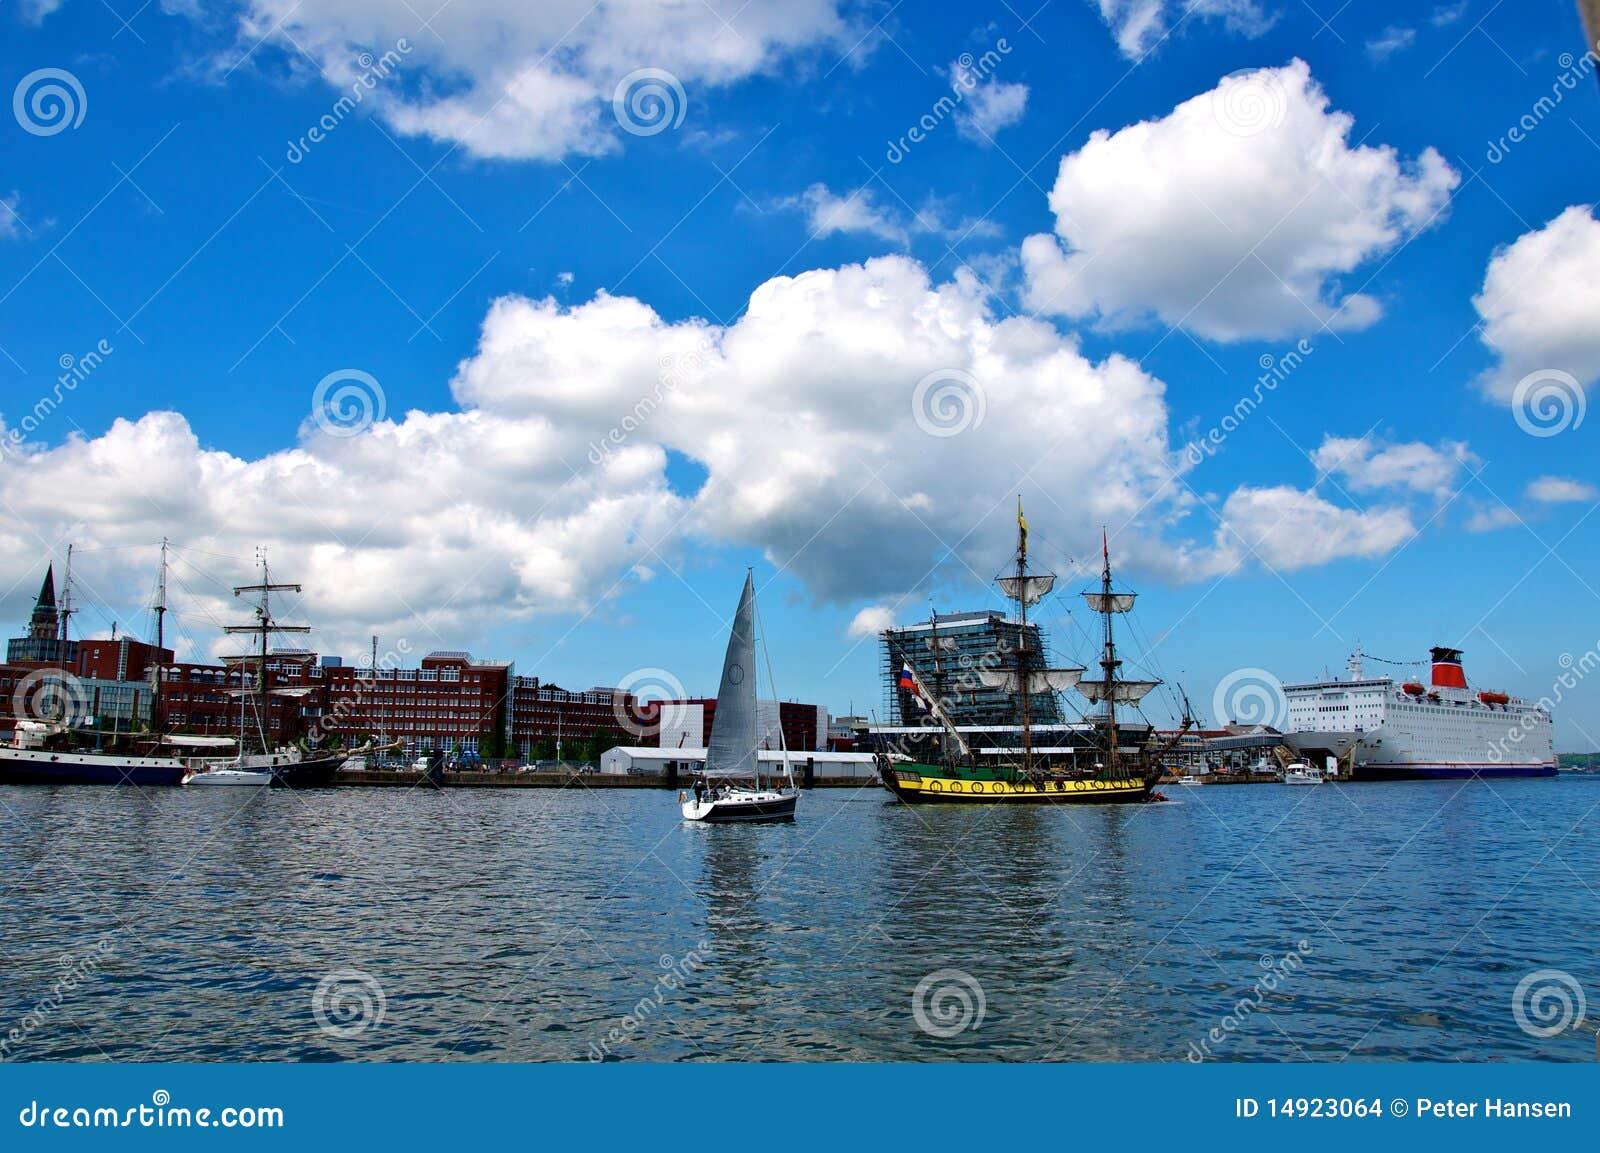 Sailing ships and cruise liner